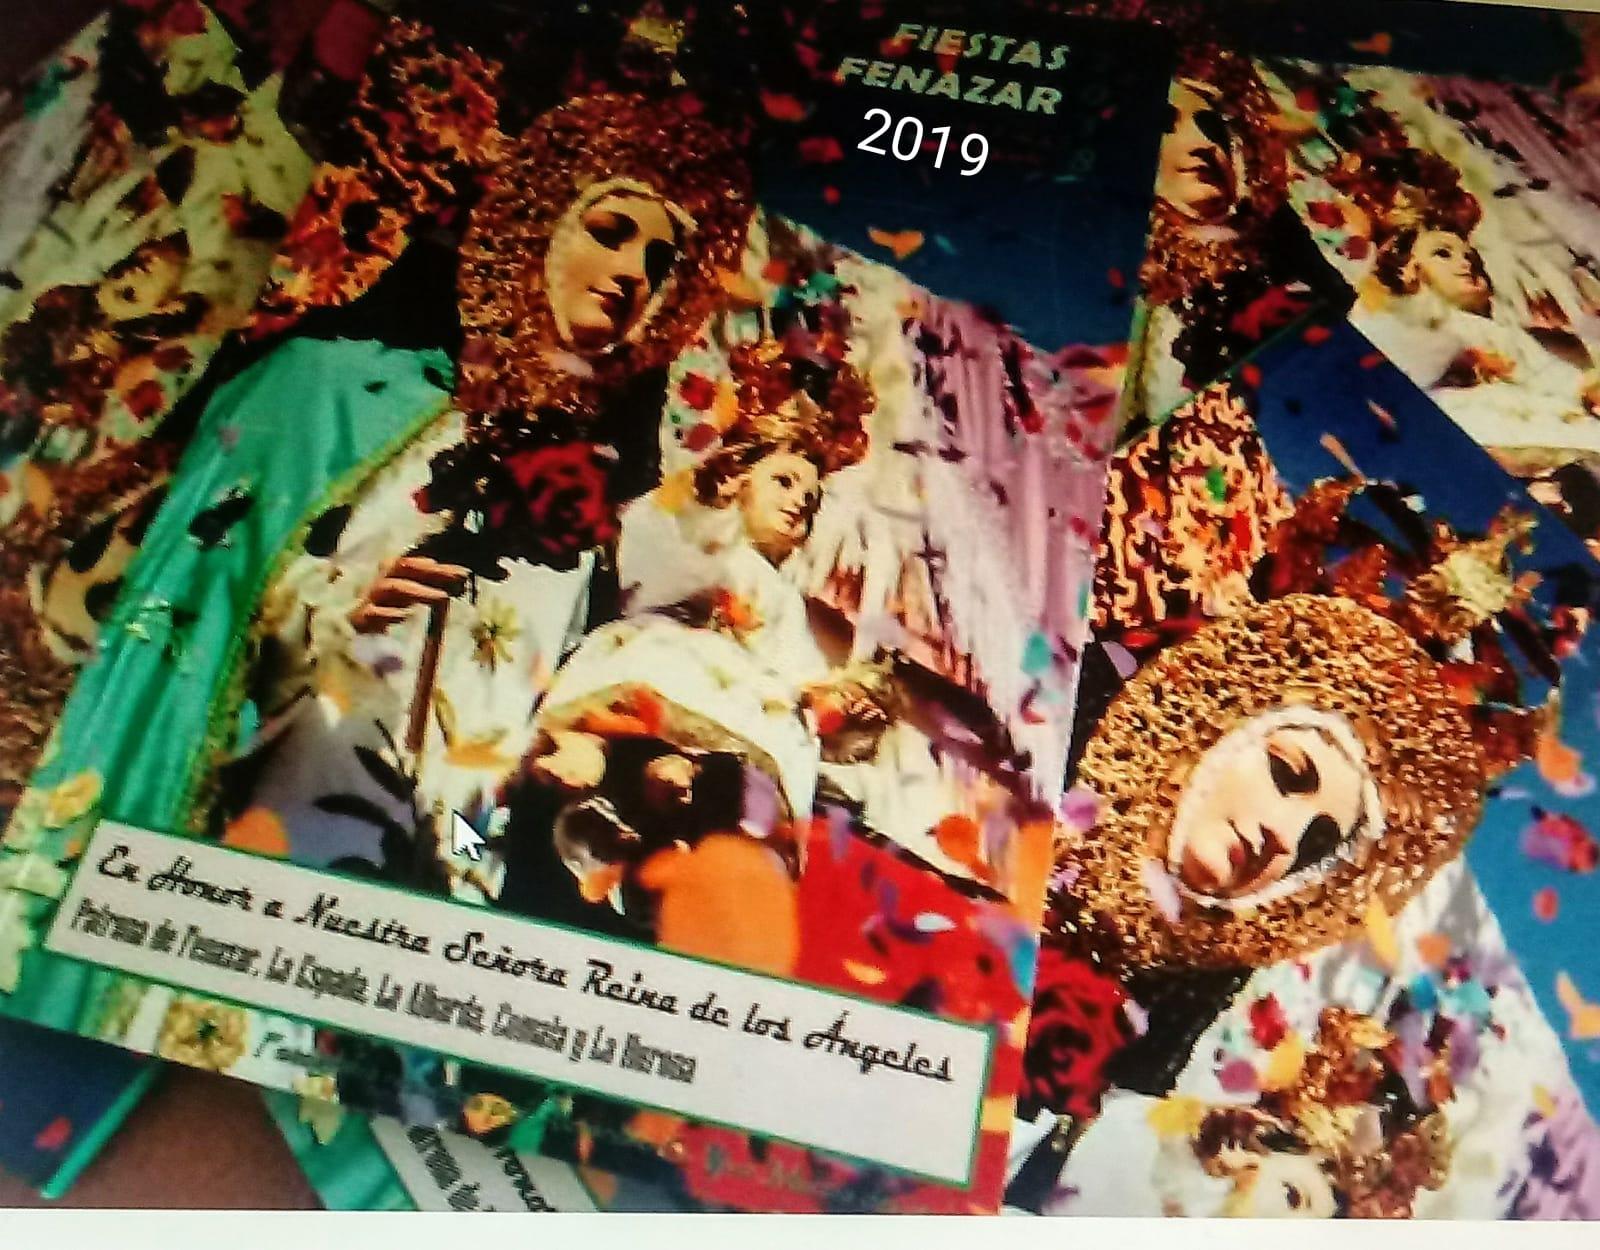 fiestas-fenazar-2019.jpg